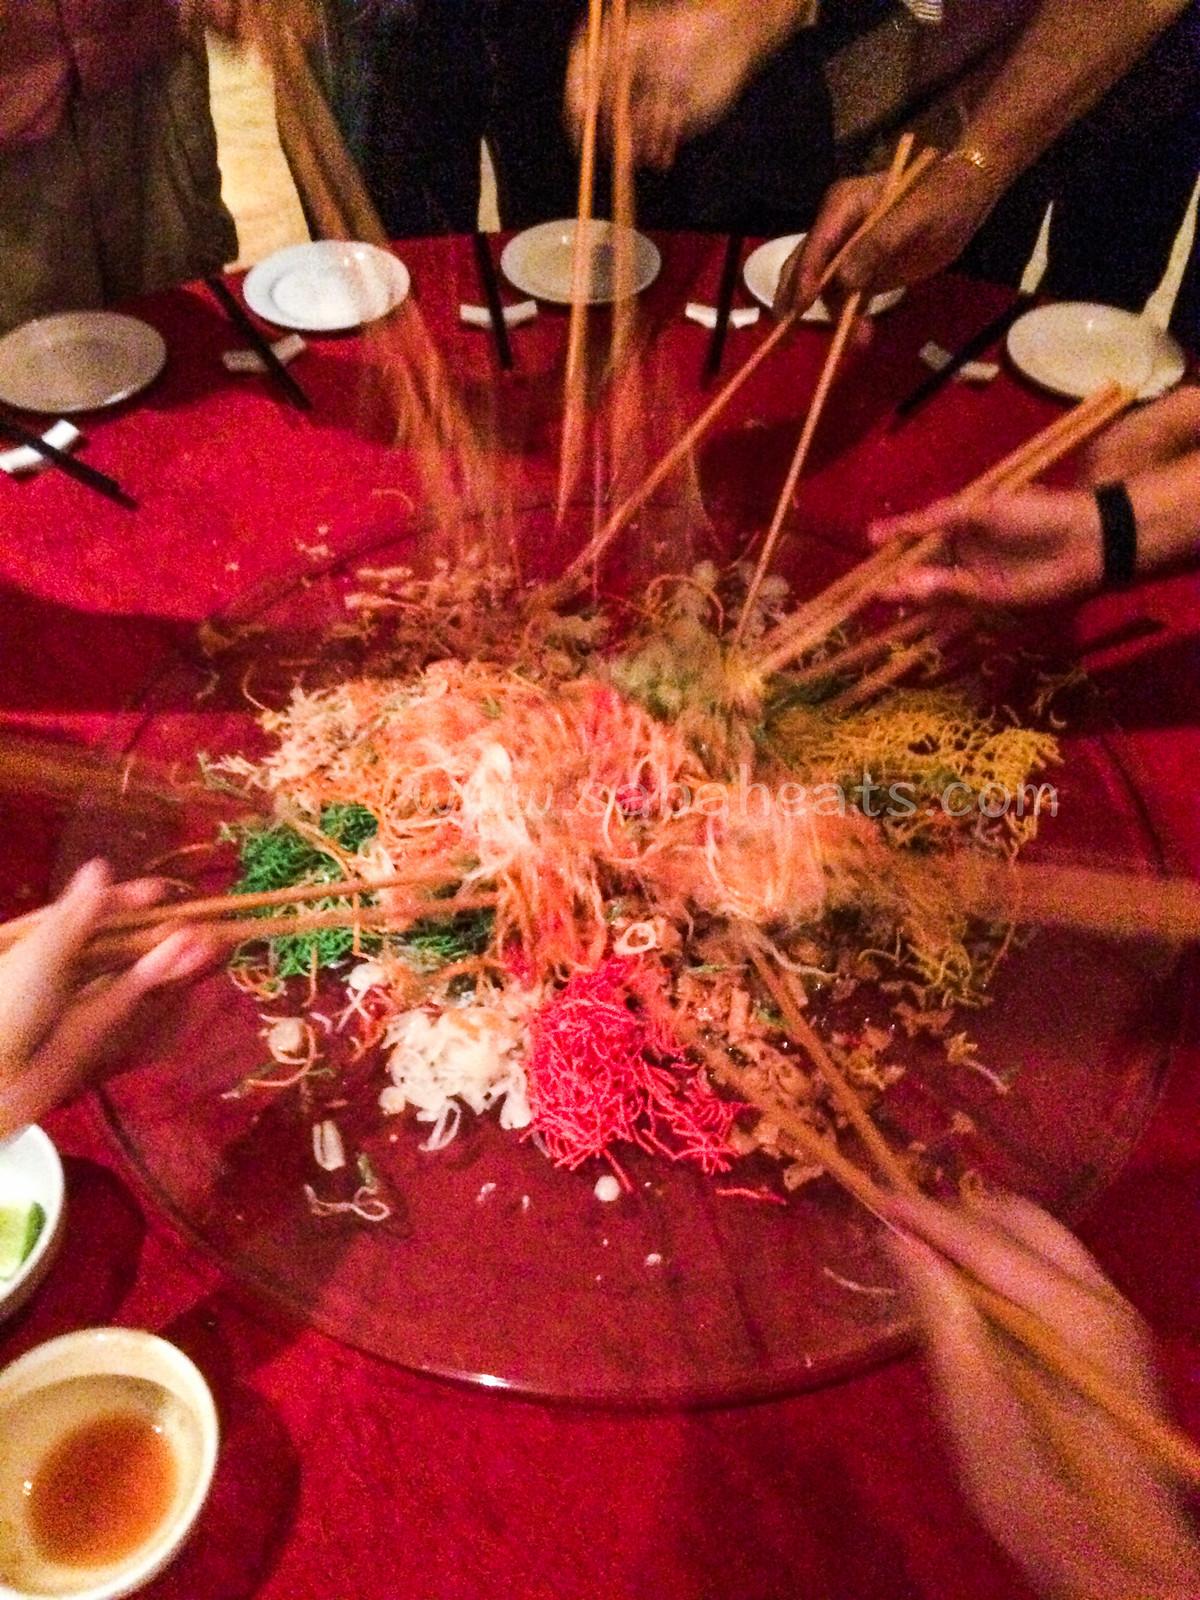 Le Meridien Kota Kinabalu Yee Sang and Chef Lum Special